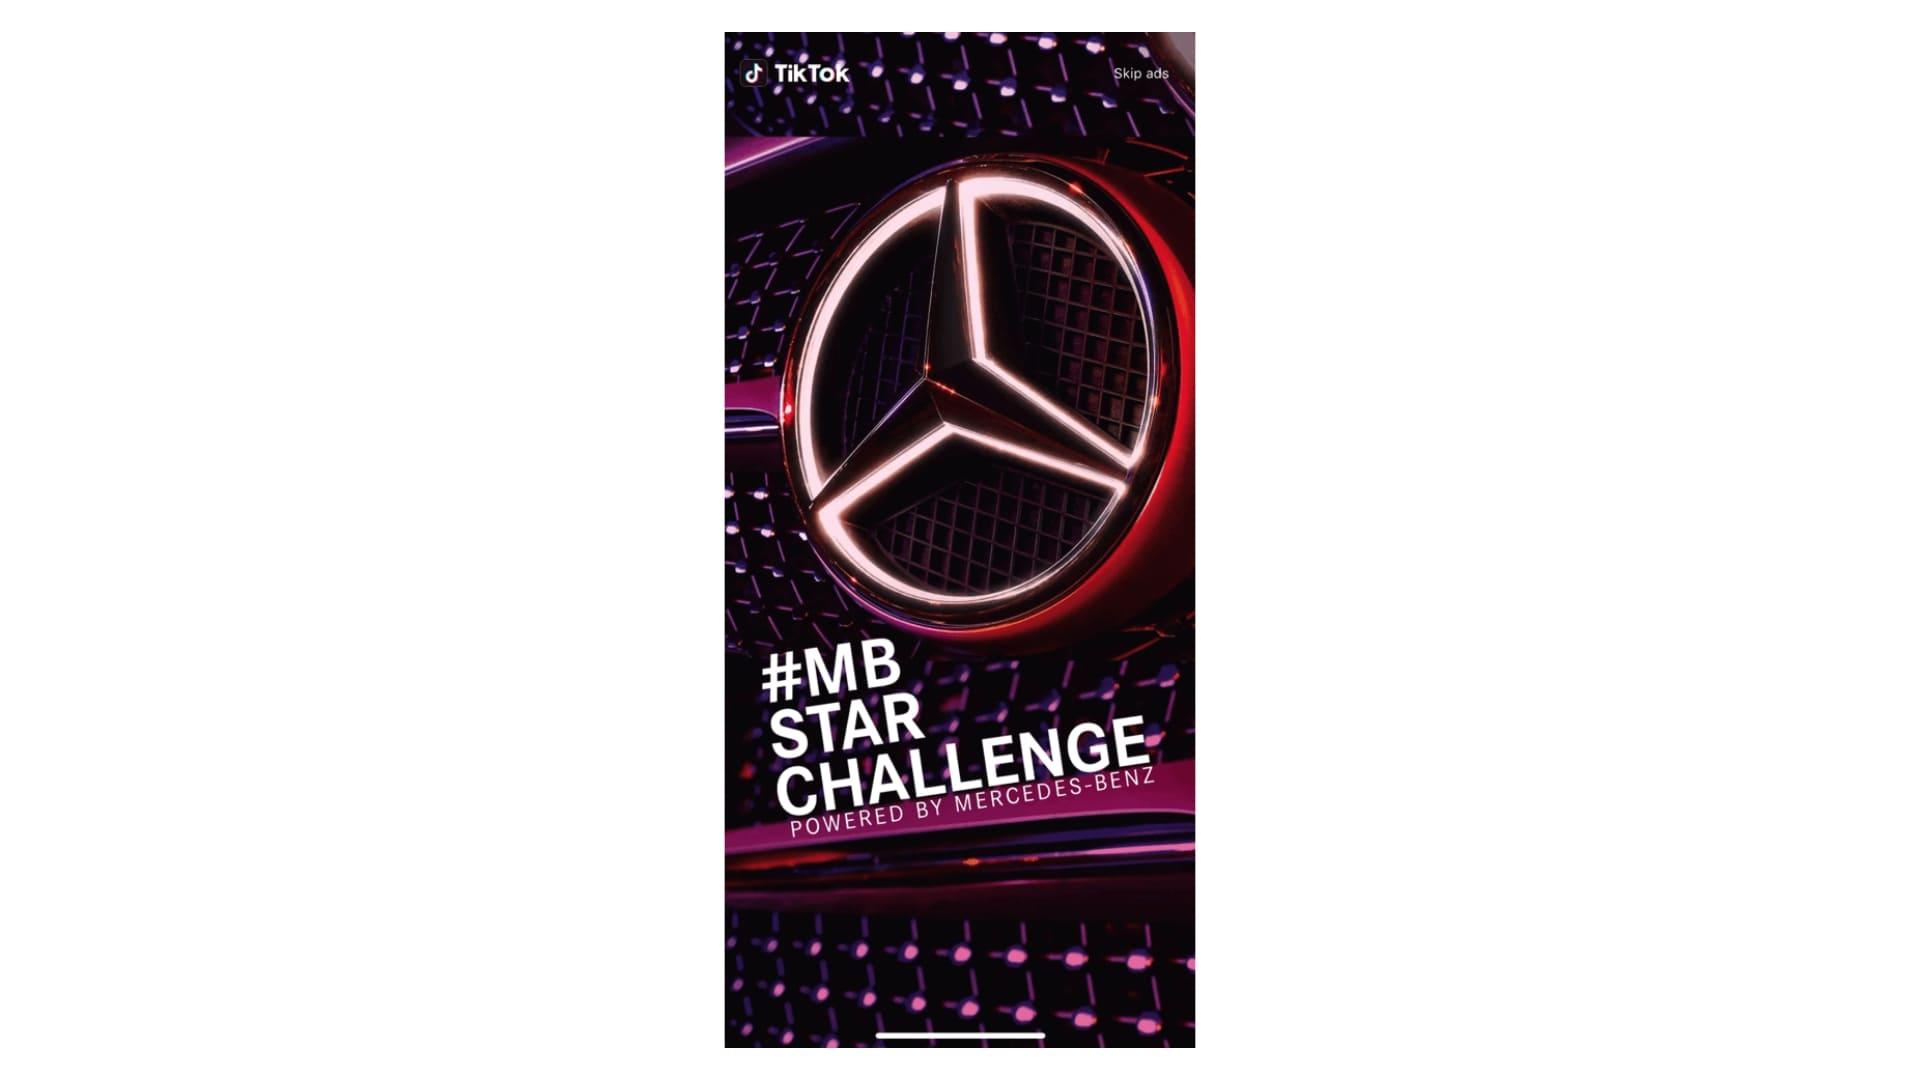 TikTok case study for Mercedes Benz